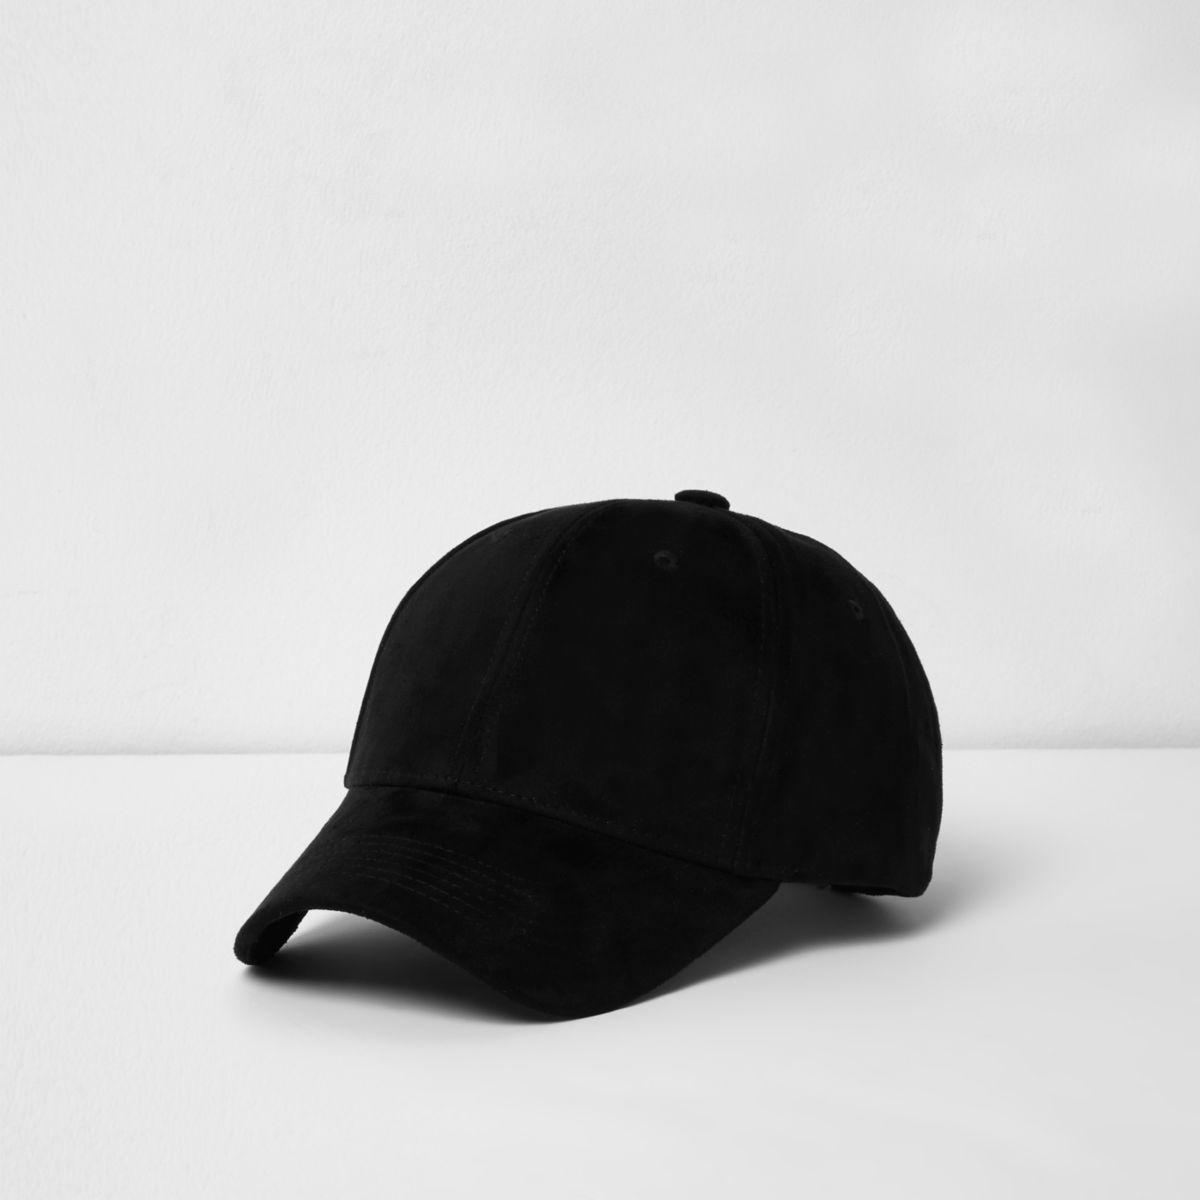 Black faux suede baseball cap